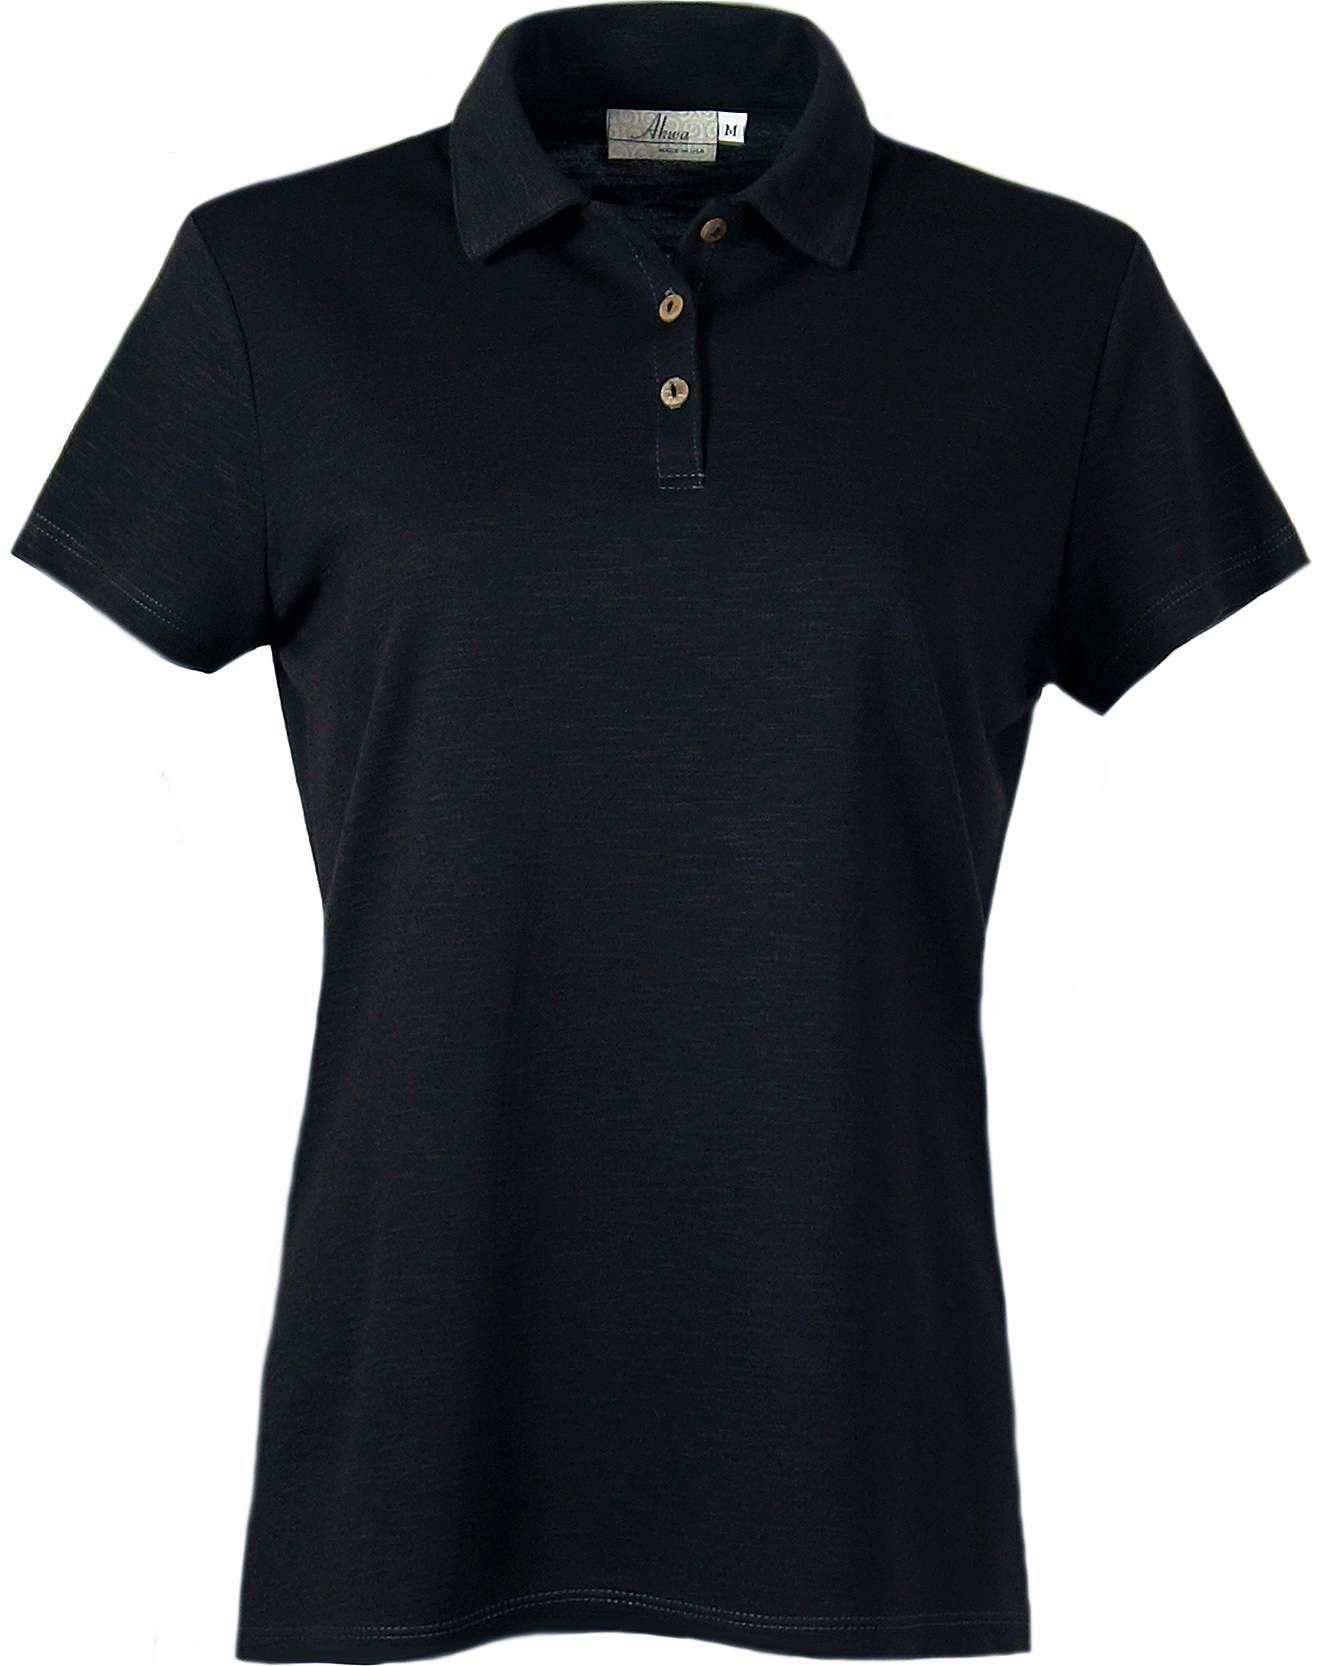 For Mens Polo Shirts Mens C 1_5